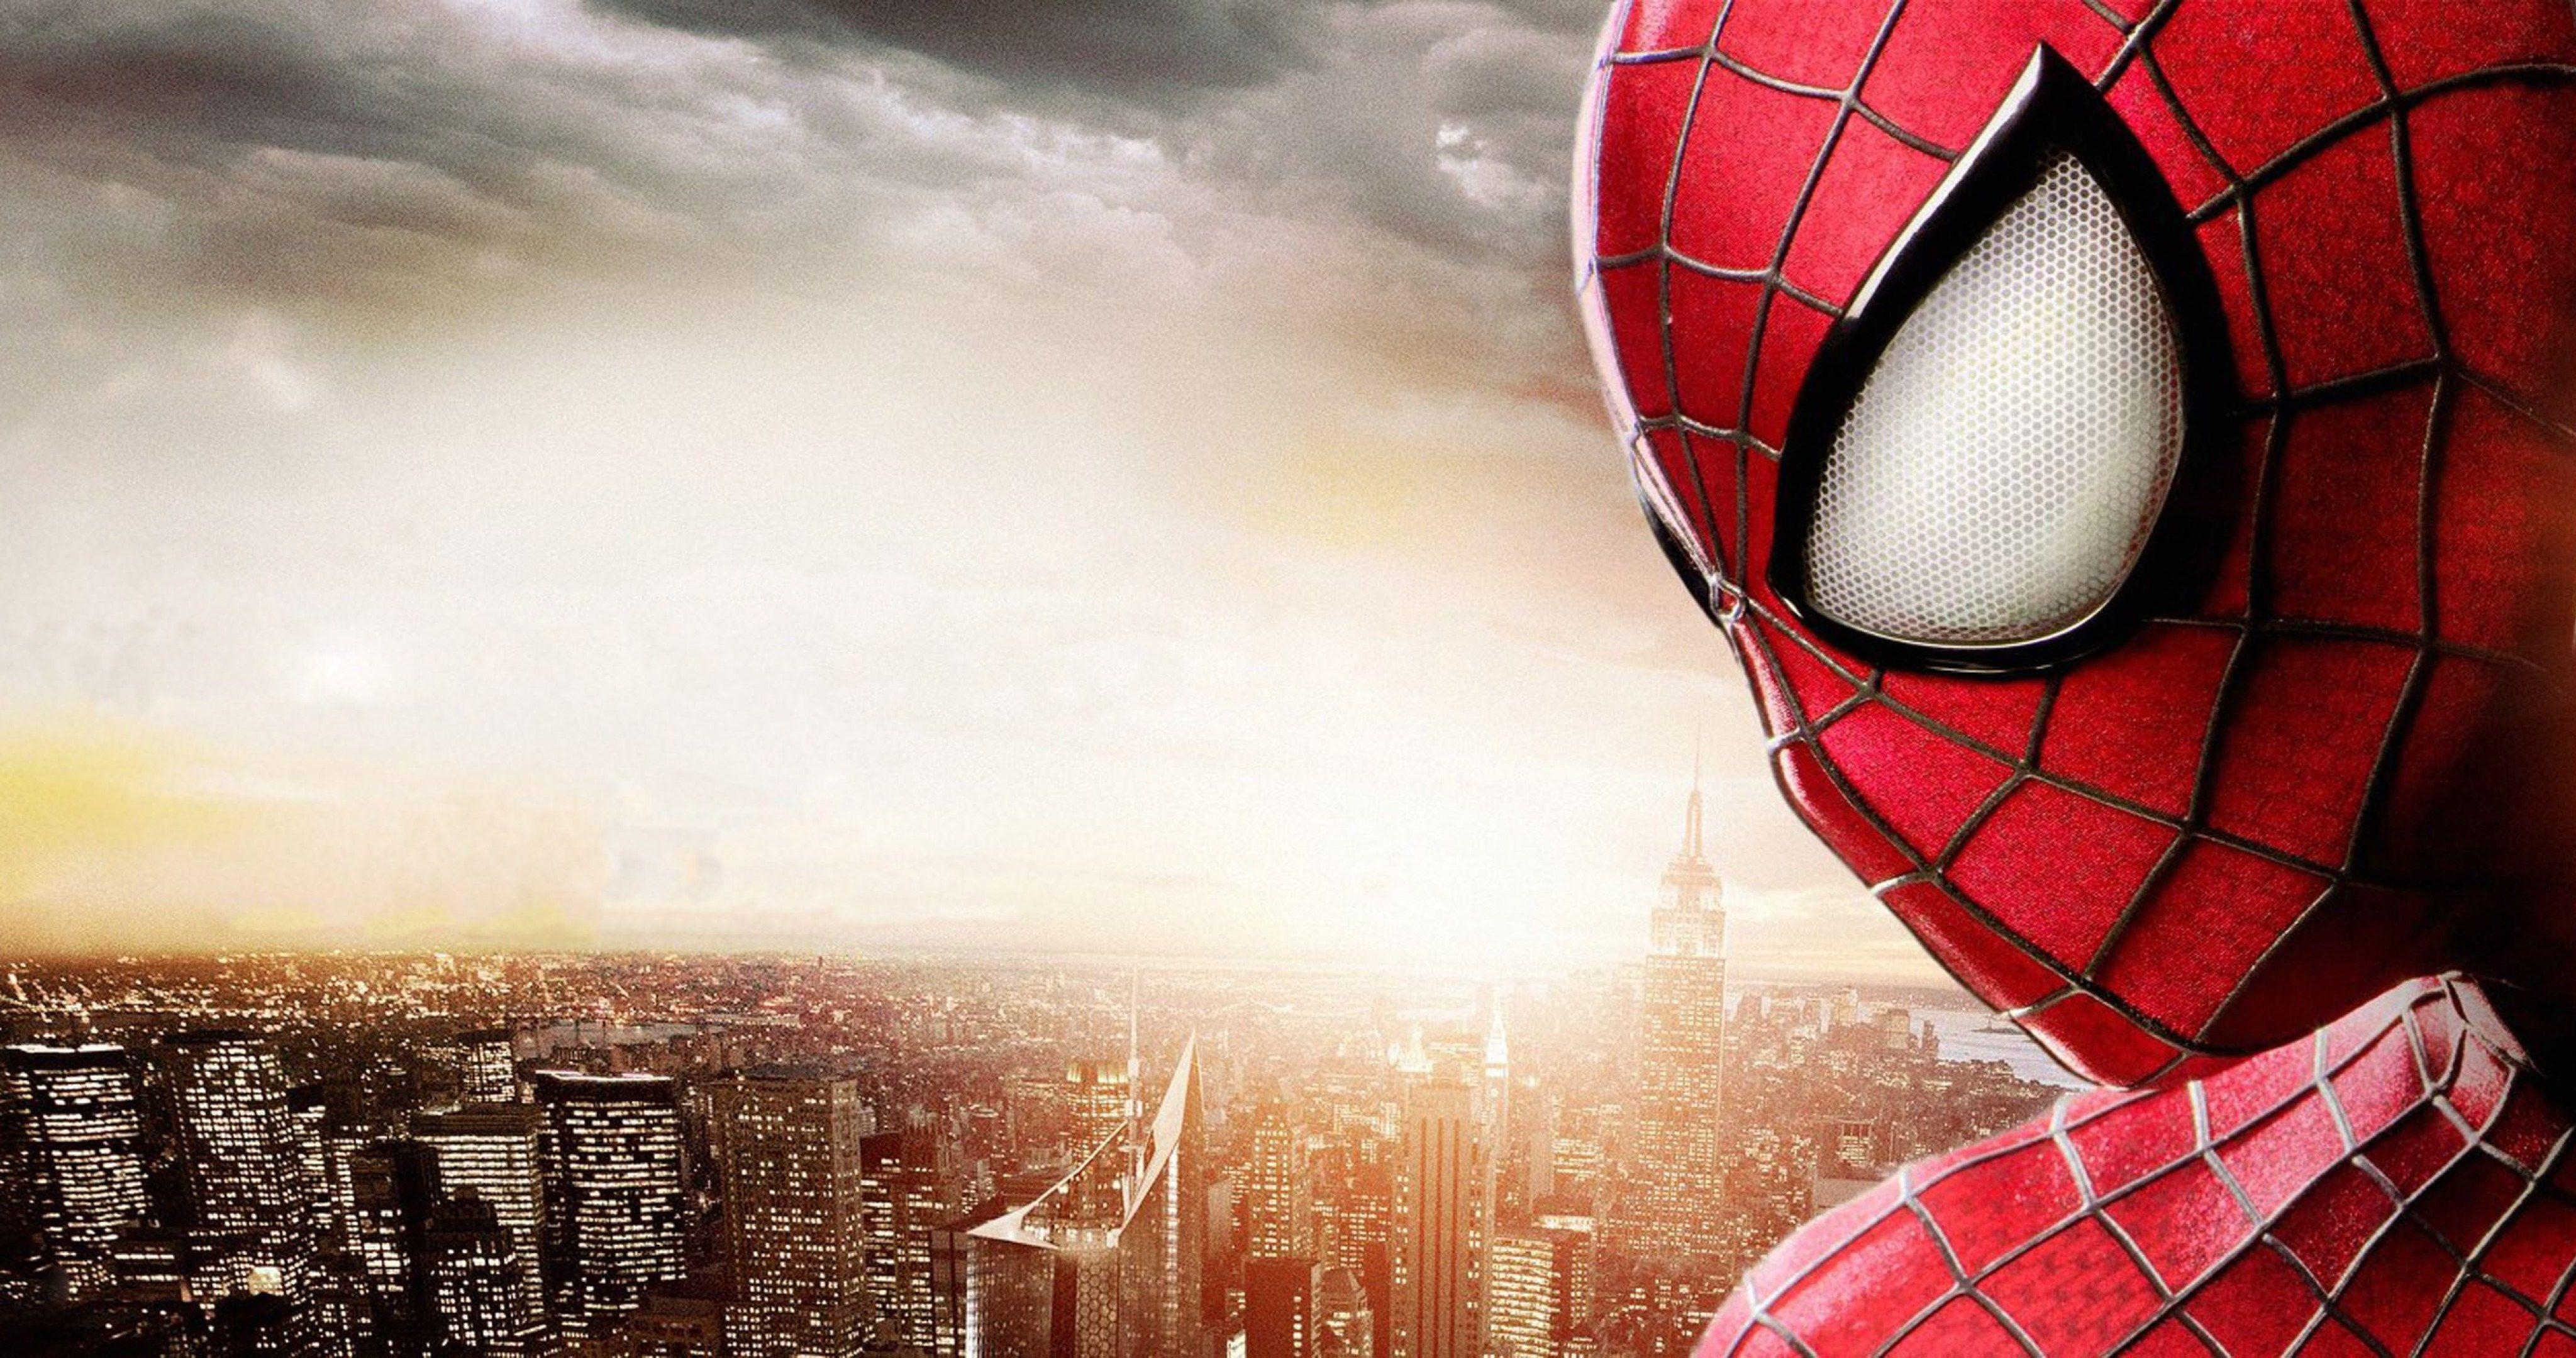 Spider Man 2014 4k Ultra Hd Wallpaper Spiderman Man Wallpaper Amazing Spider